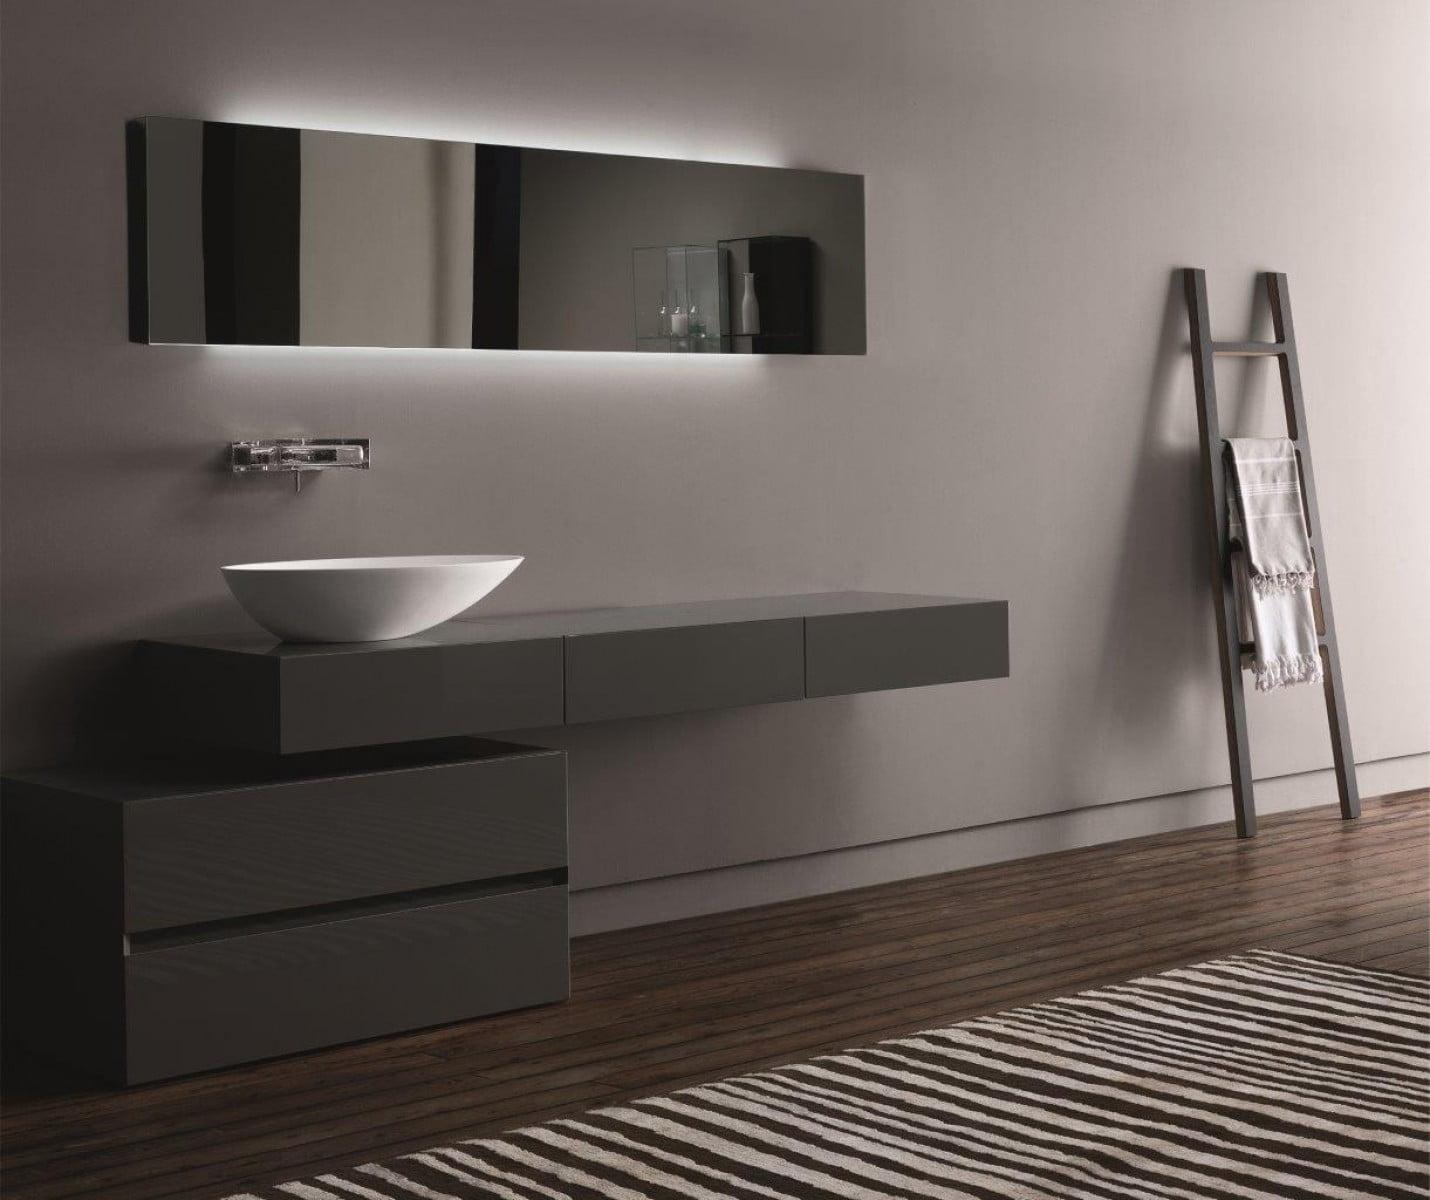 7 Diseños de cuartos de baño modernos - Constructora Paramount